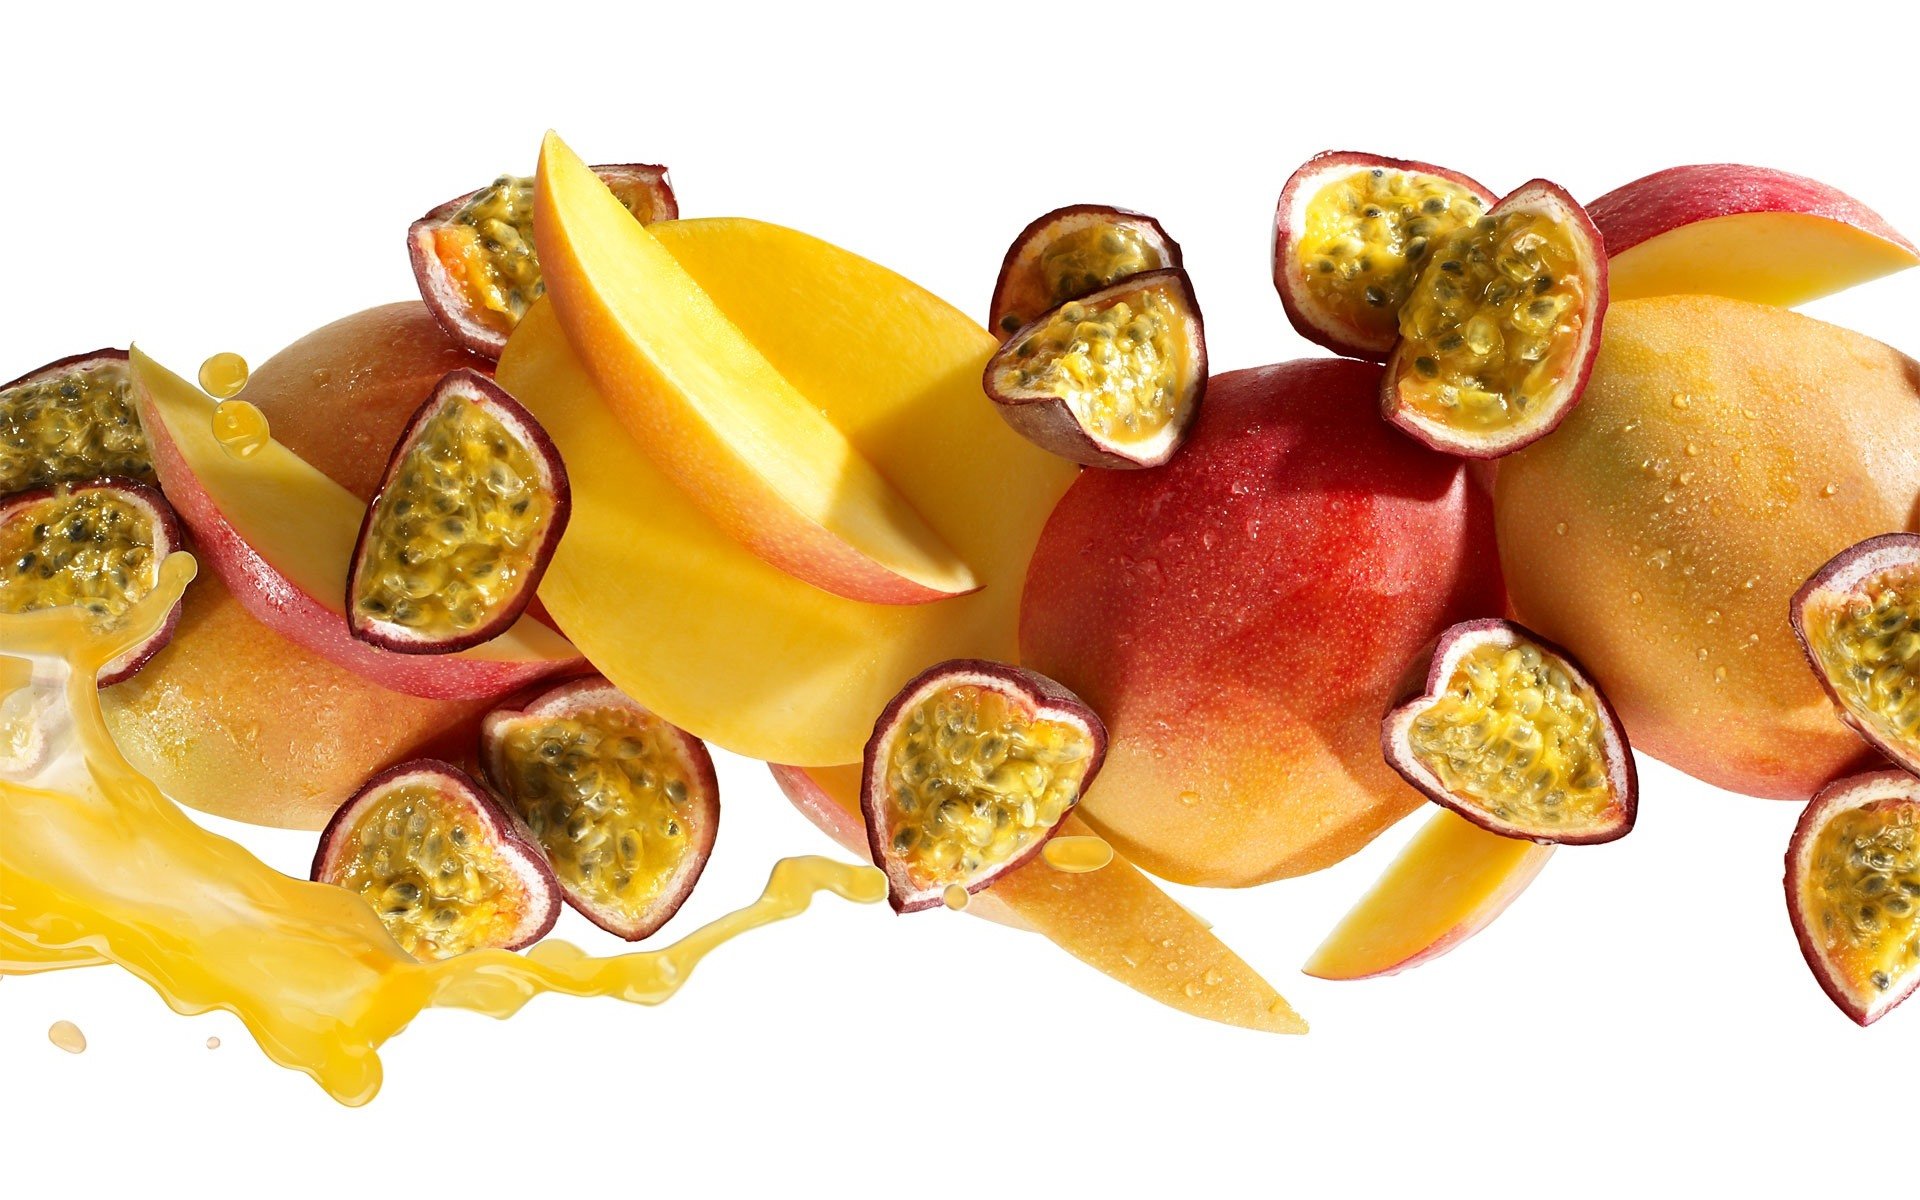 Wallpaper Passion Fruit Mango Apple Slices 1920x1200 Hd Picture Image